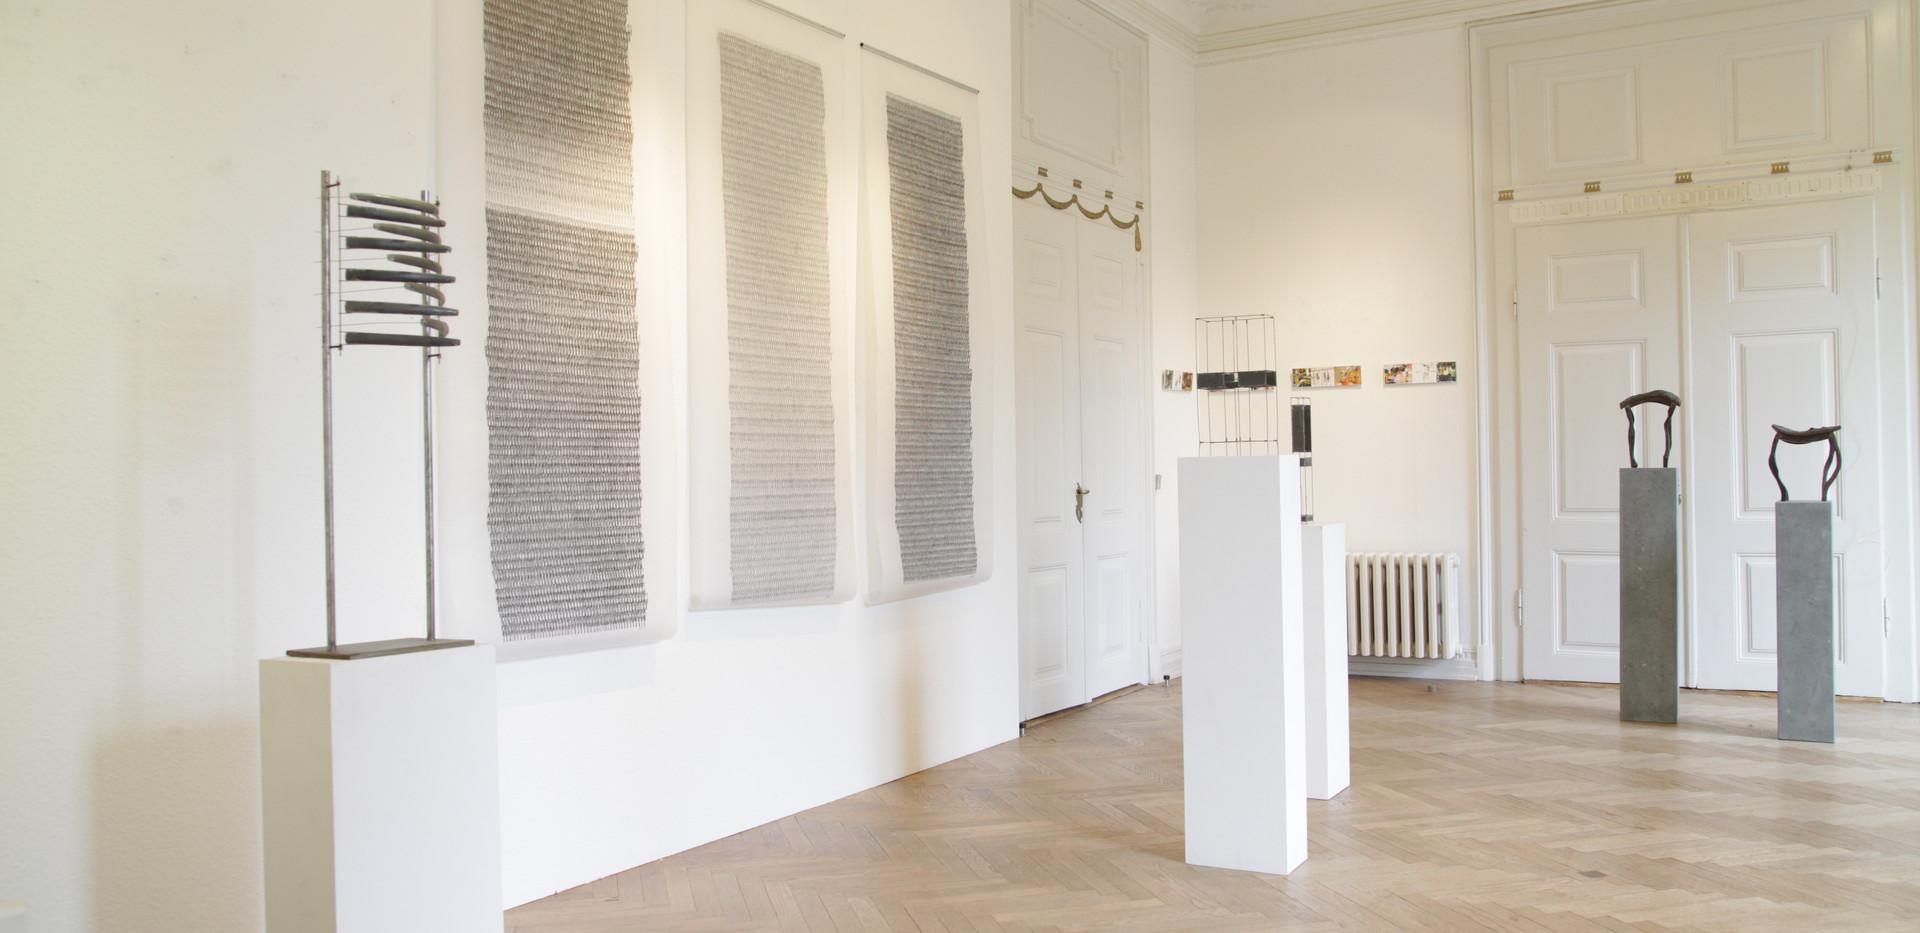 Künstler:  Michelé Ammonn Ingo Warnke Wübke Rolfs-Grigull Norbert Poredda